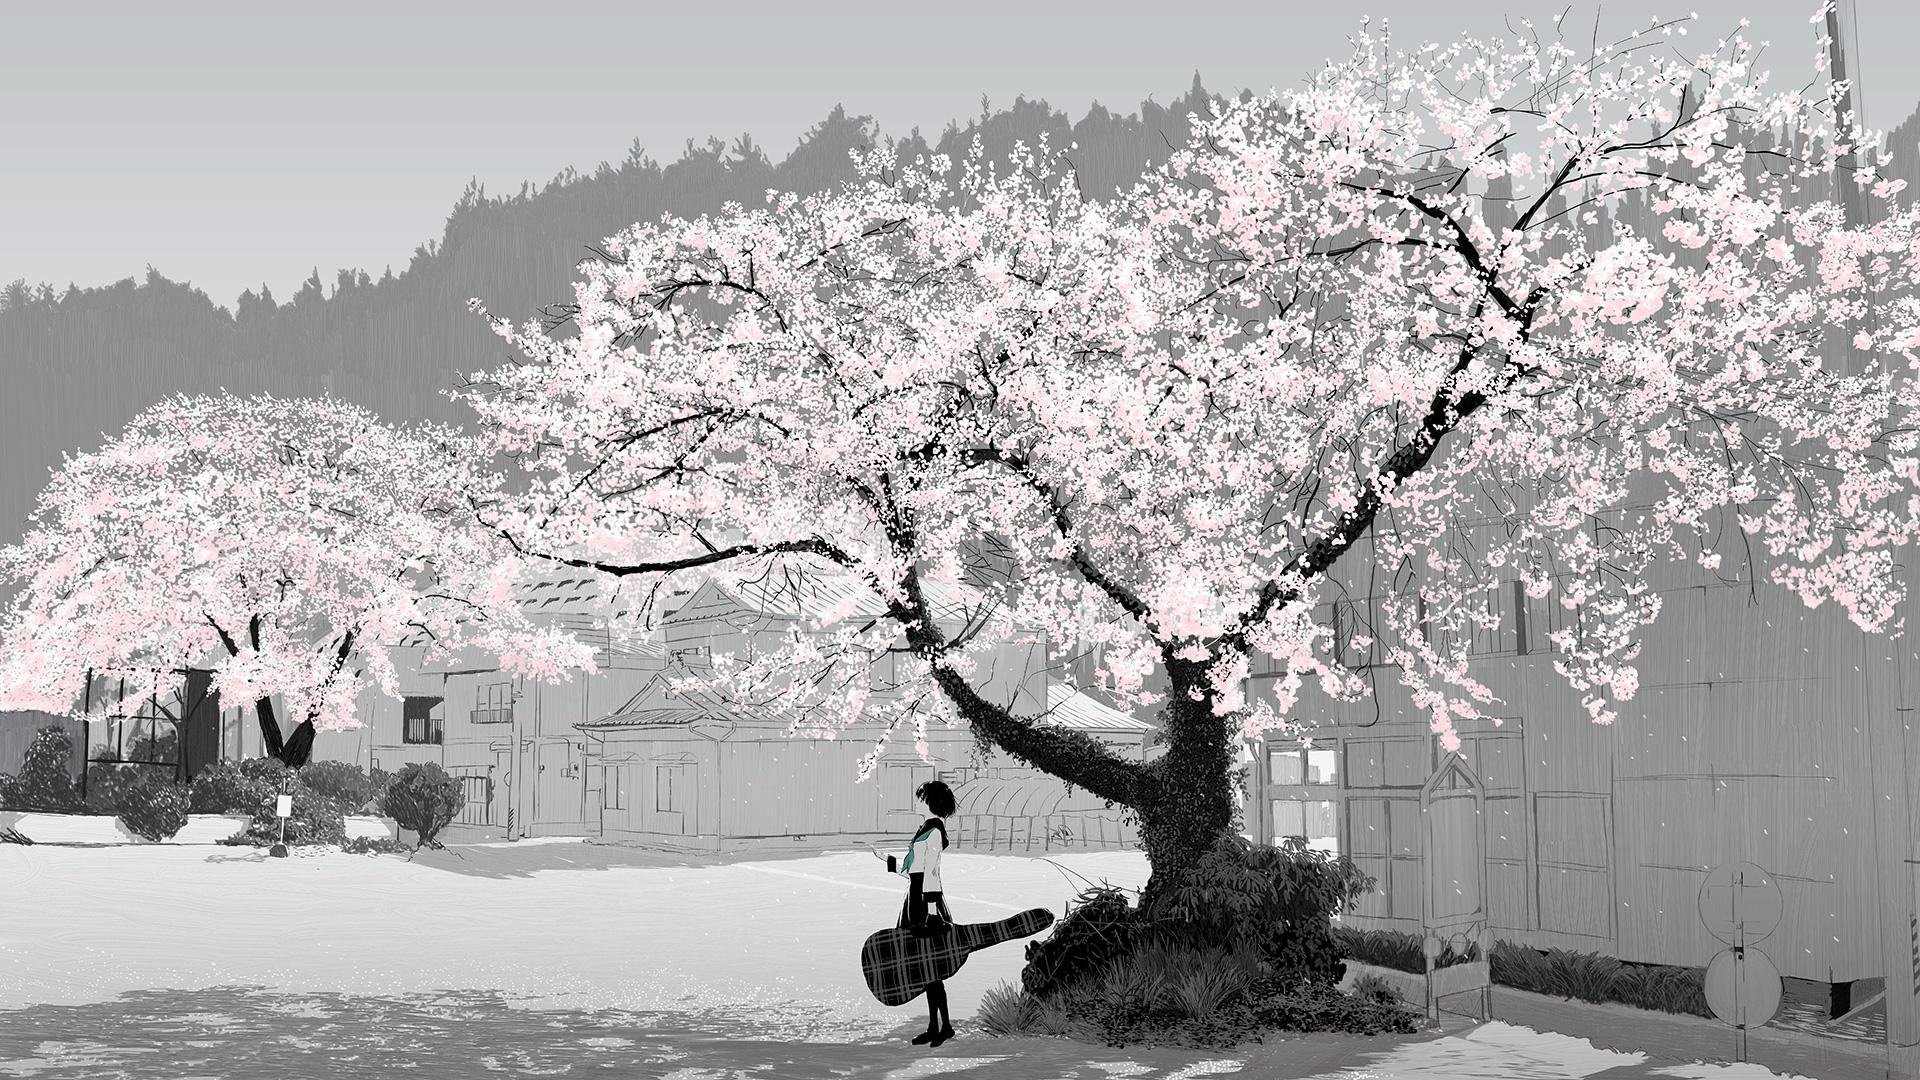 Original Anime Tree Sakura Blossom Guitar School Uniform Skirt Short Hair Girl Black Hair 1920x1080